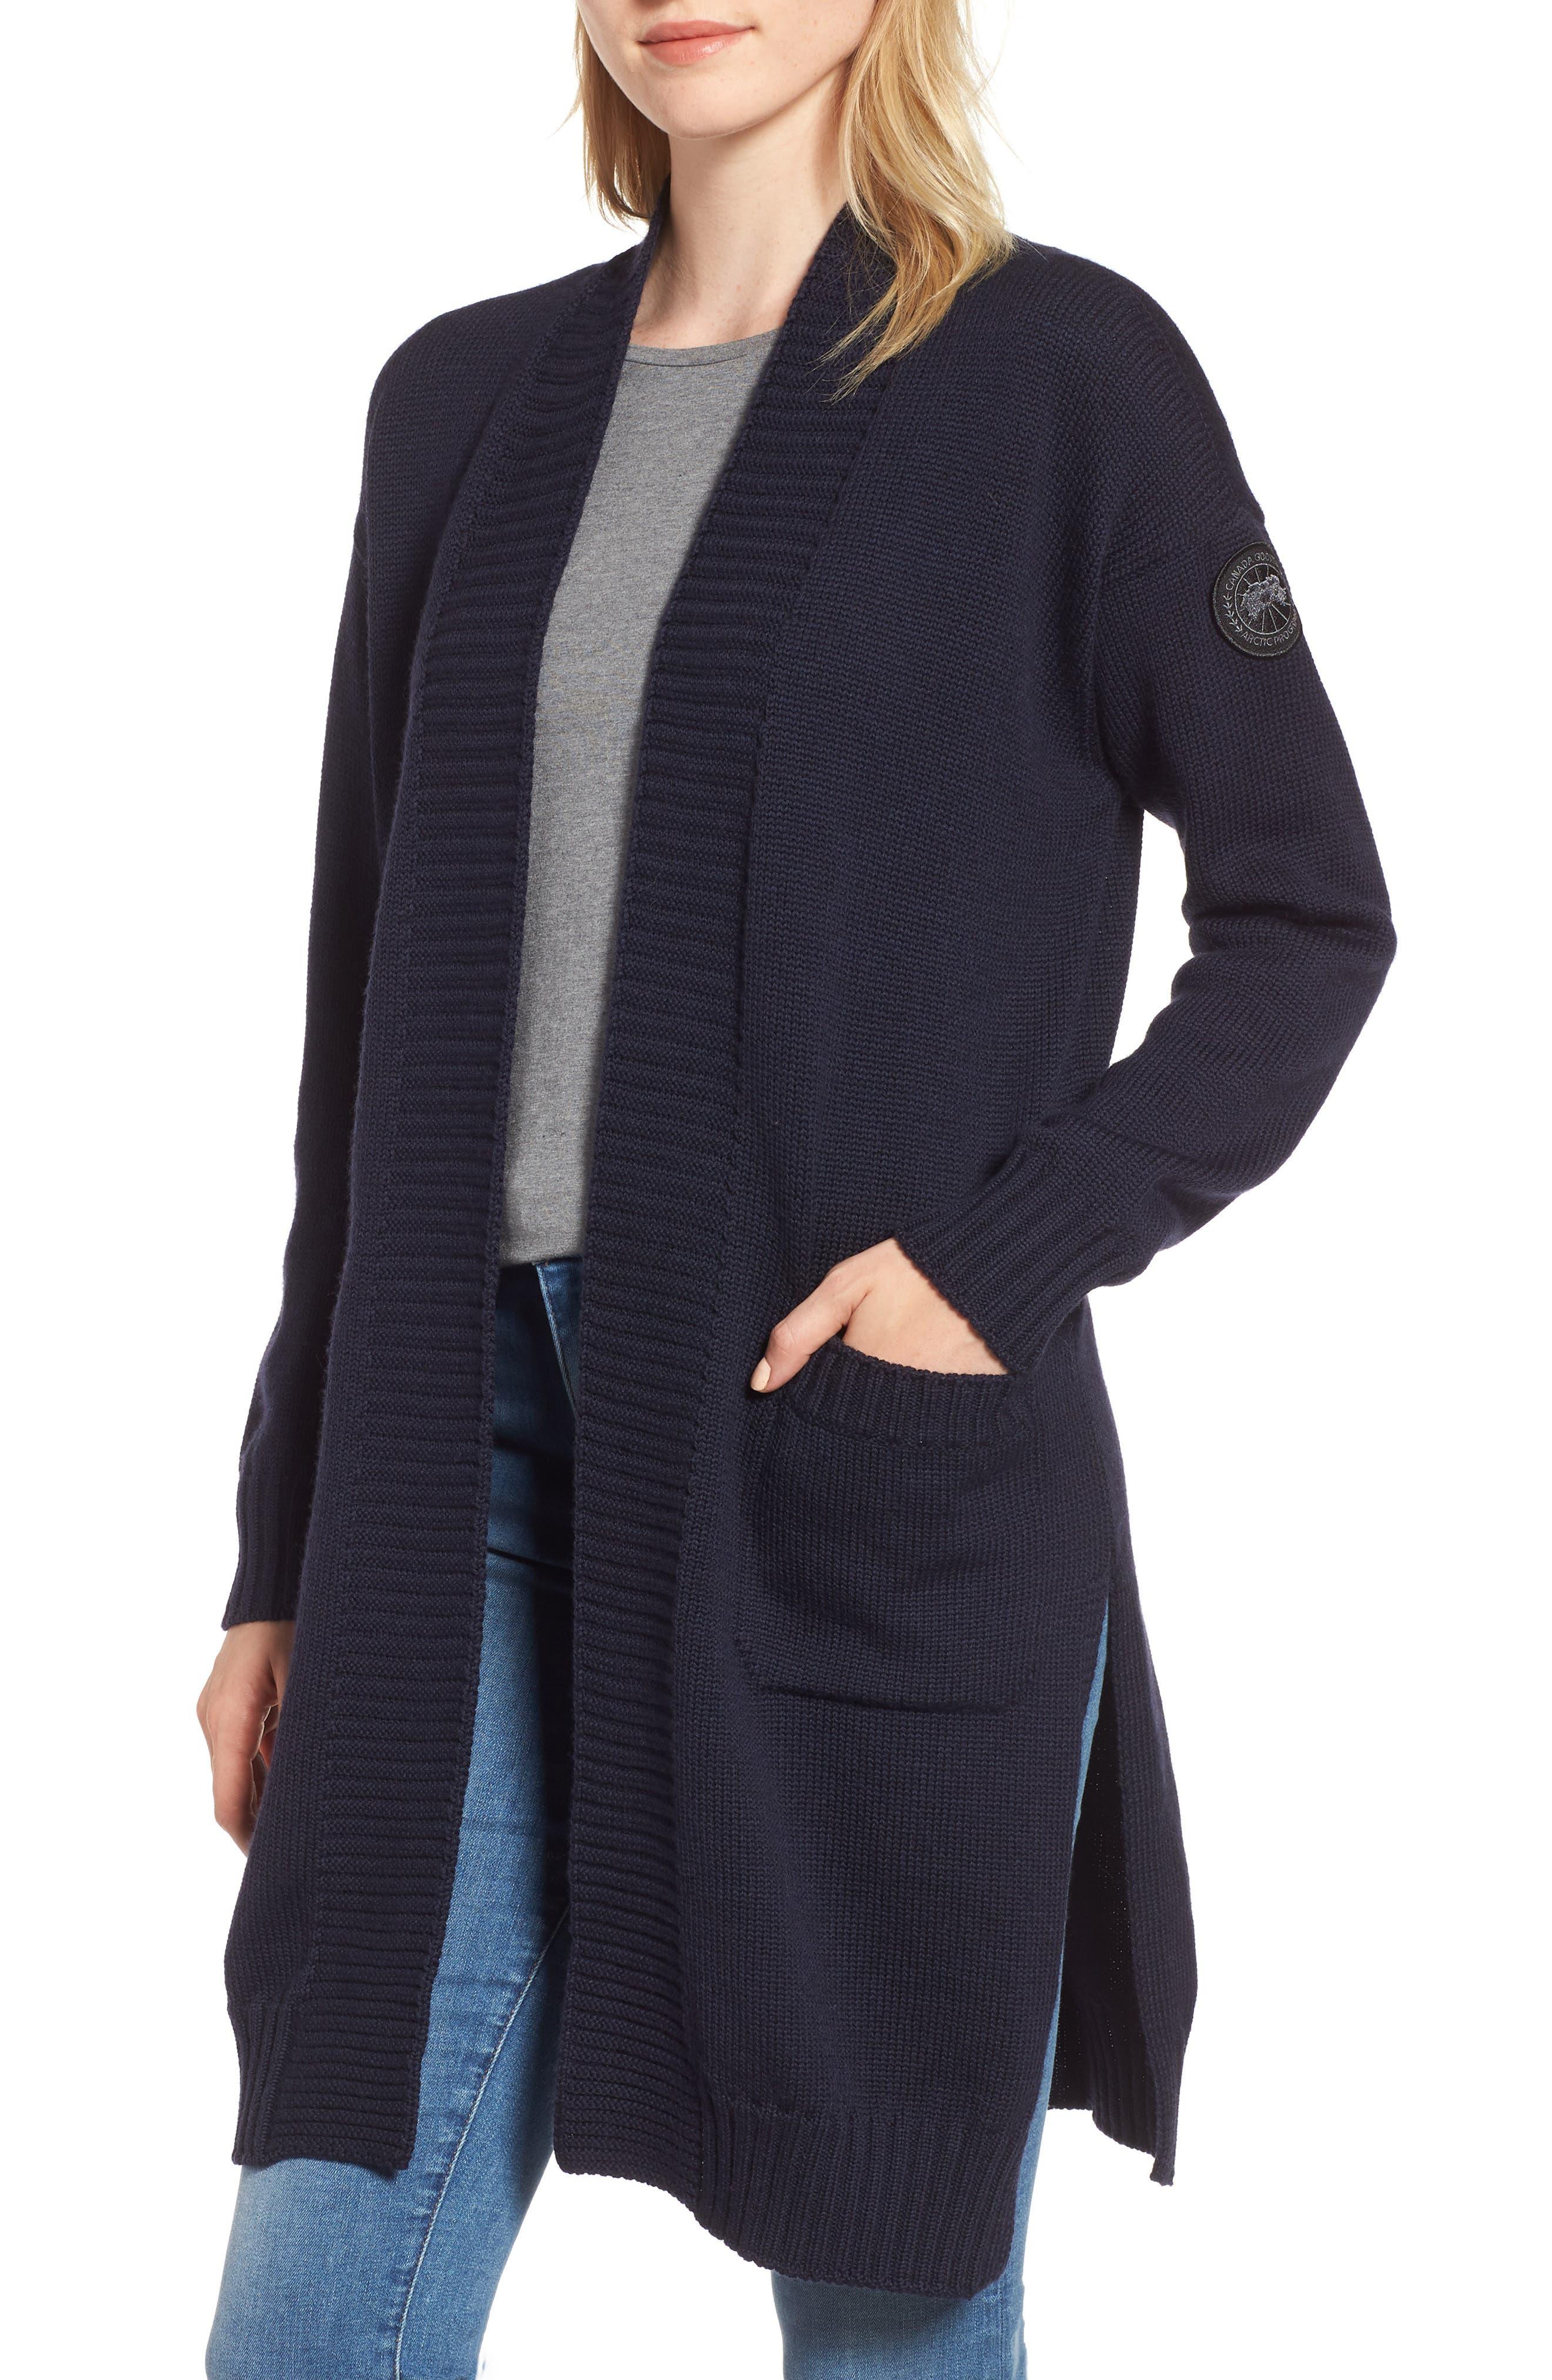 Cortina Long Merino Wool Cardigan in Navy